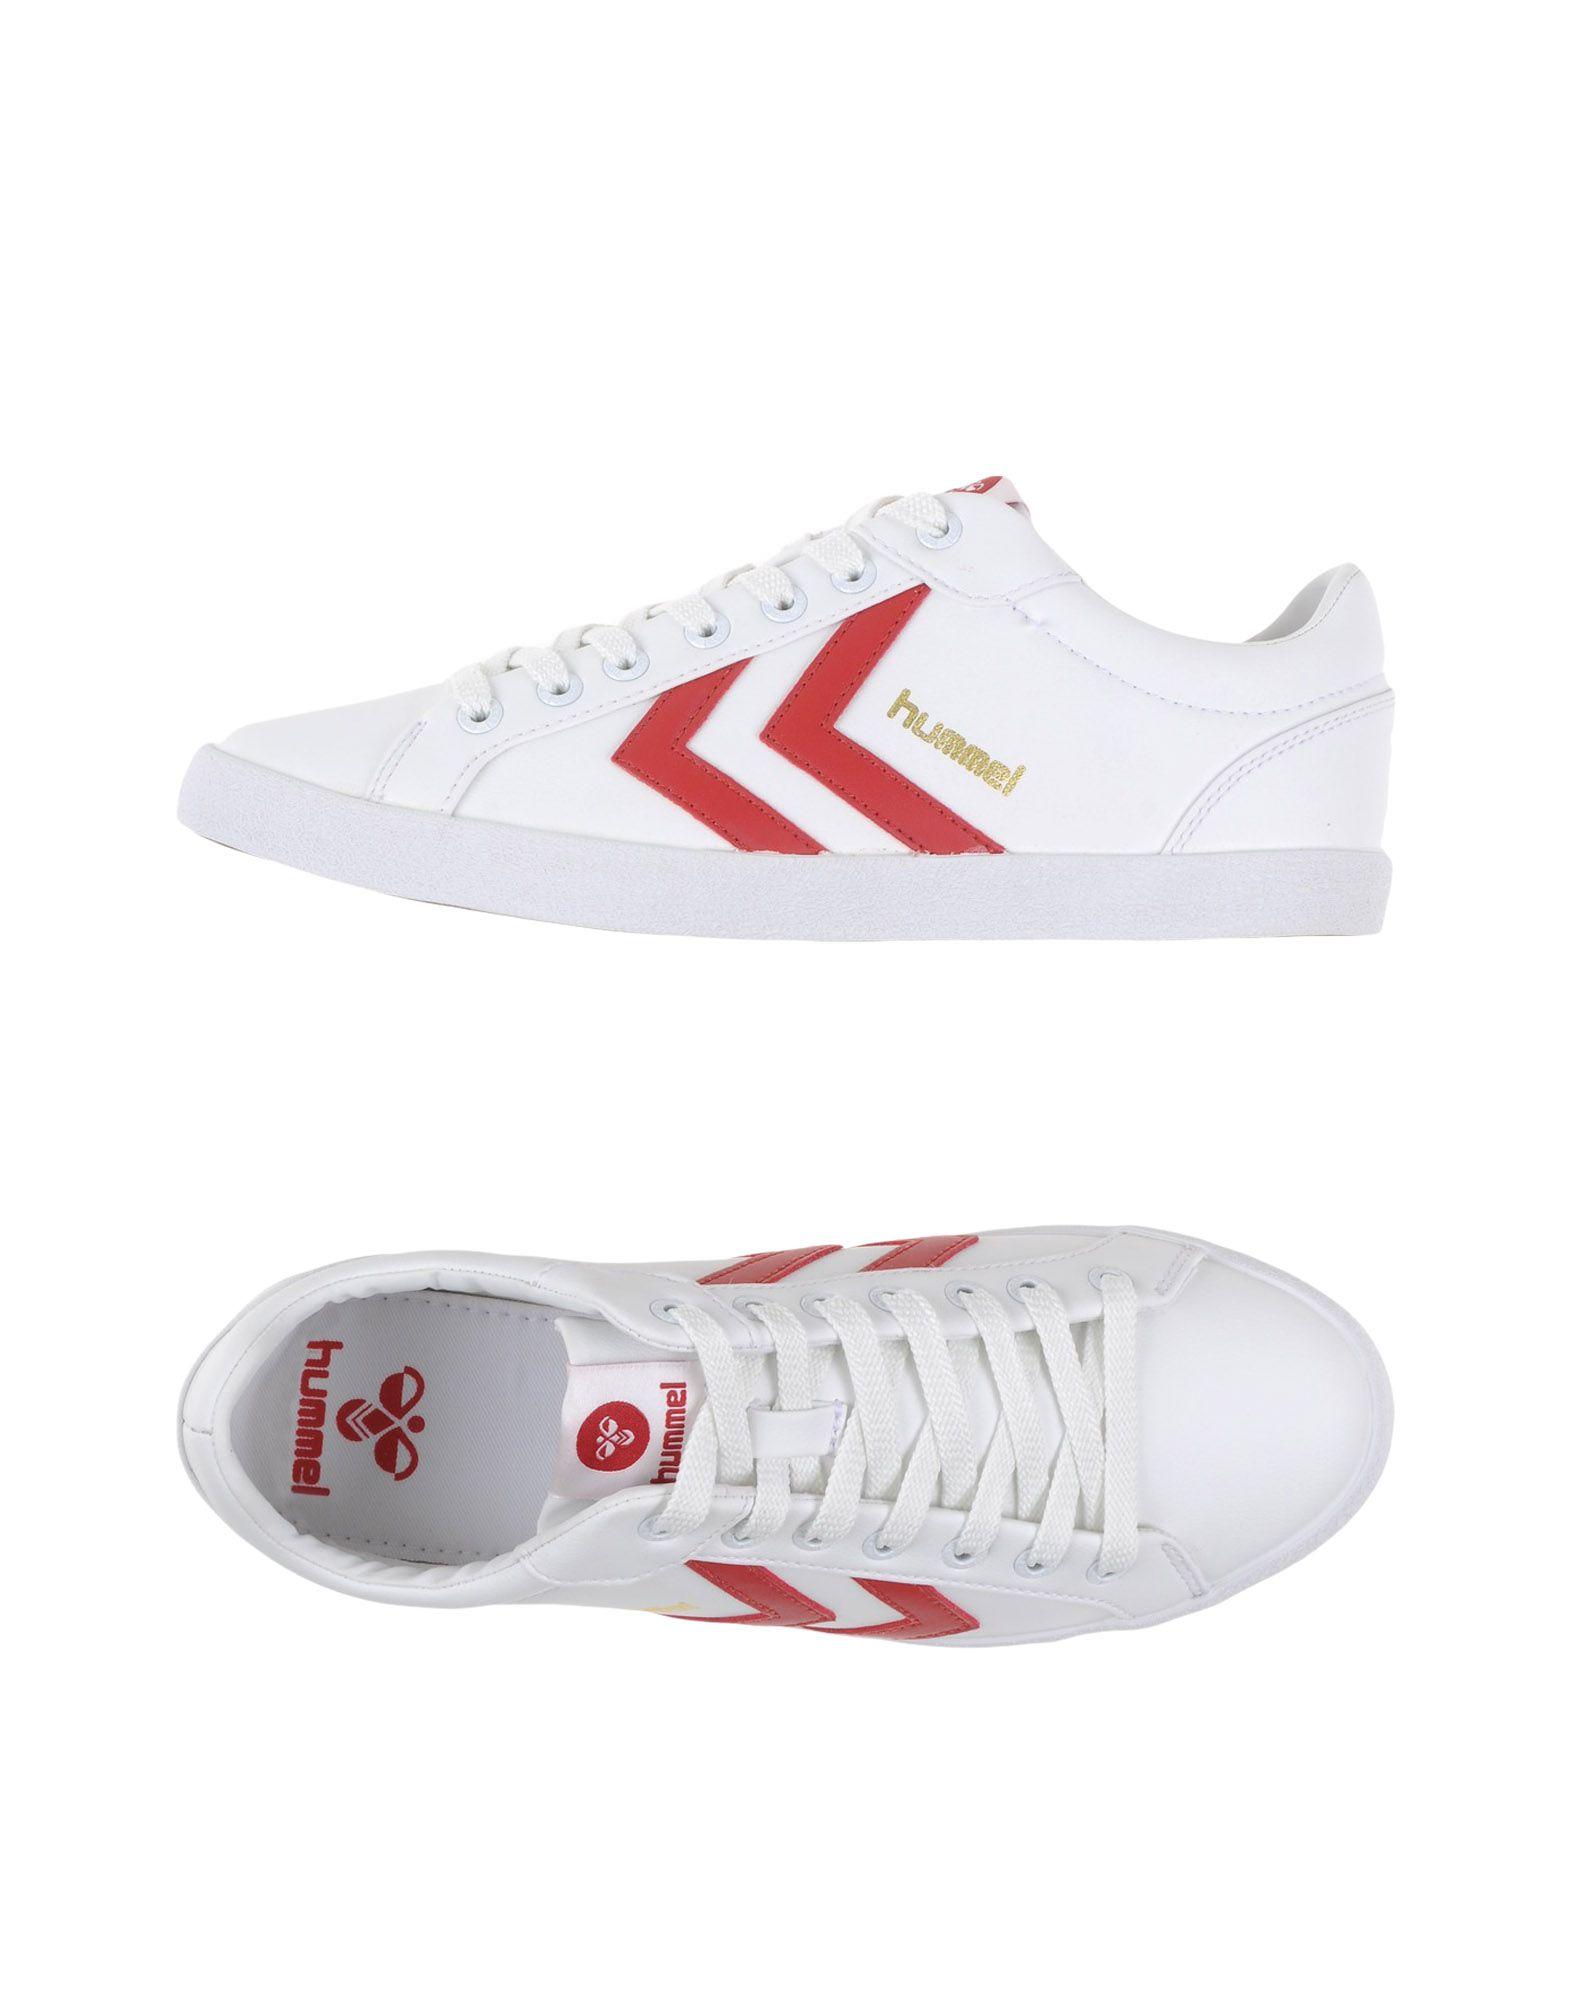 Hummel Hummel Hummel Deuce Court Sport - Sneakers - Women Hummel Sneakers online on  Canada - 11018321XI 0e7d6f